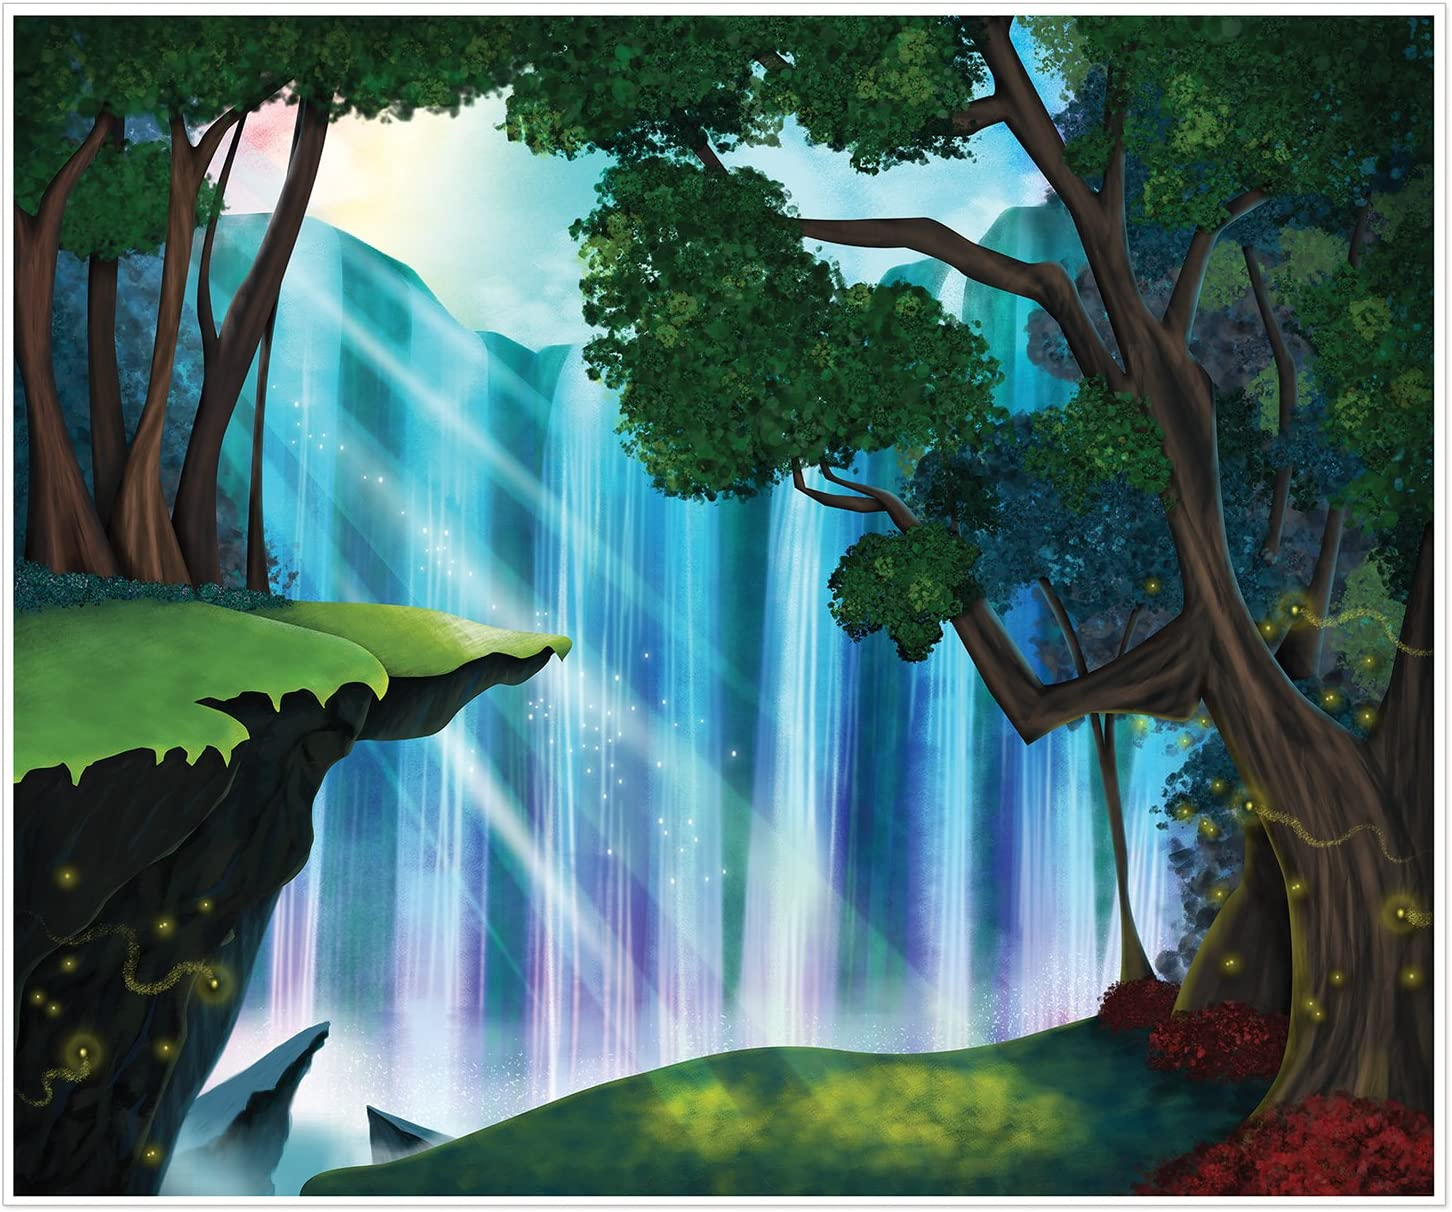 Beistle Fantasy Insta-Mural Wall Art Decor | Fantasy & Fairy Tale Theme Birthday Party Supplies & Decoration